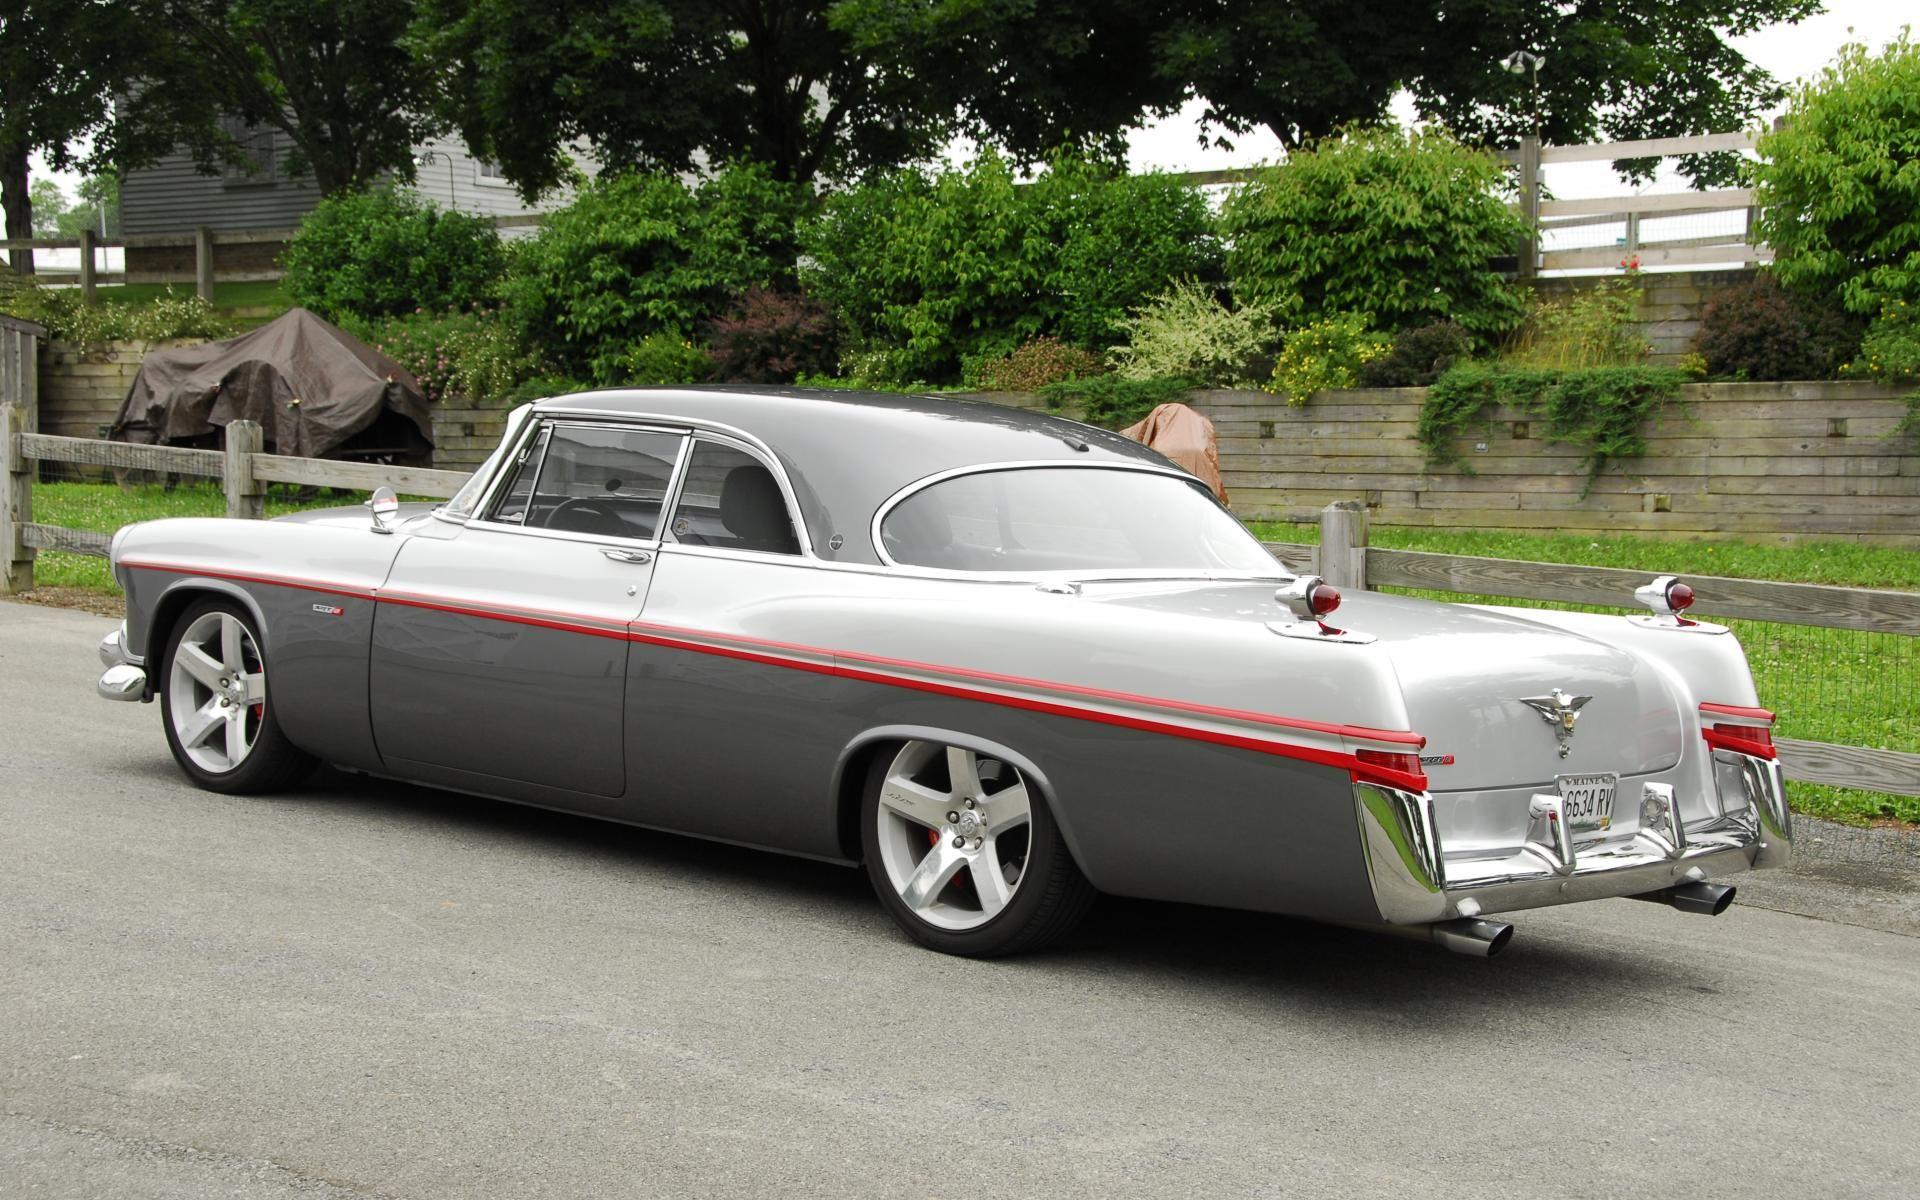 custom_imperial_chrysler_58_rod_car_1958_1920x1200_hd-wallpaper-812156.jpg (1920×1200)